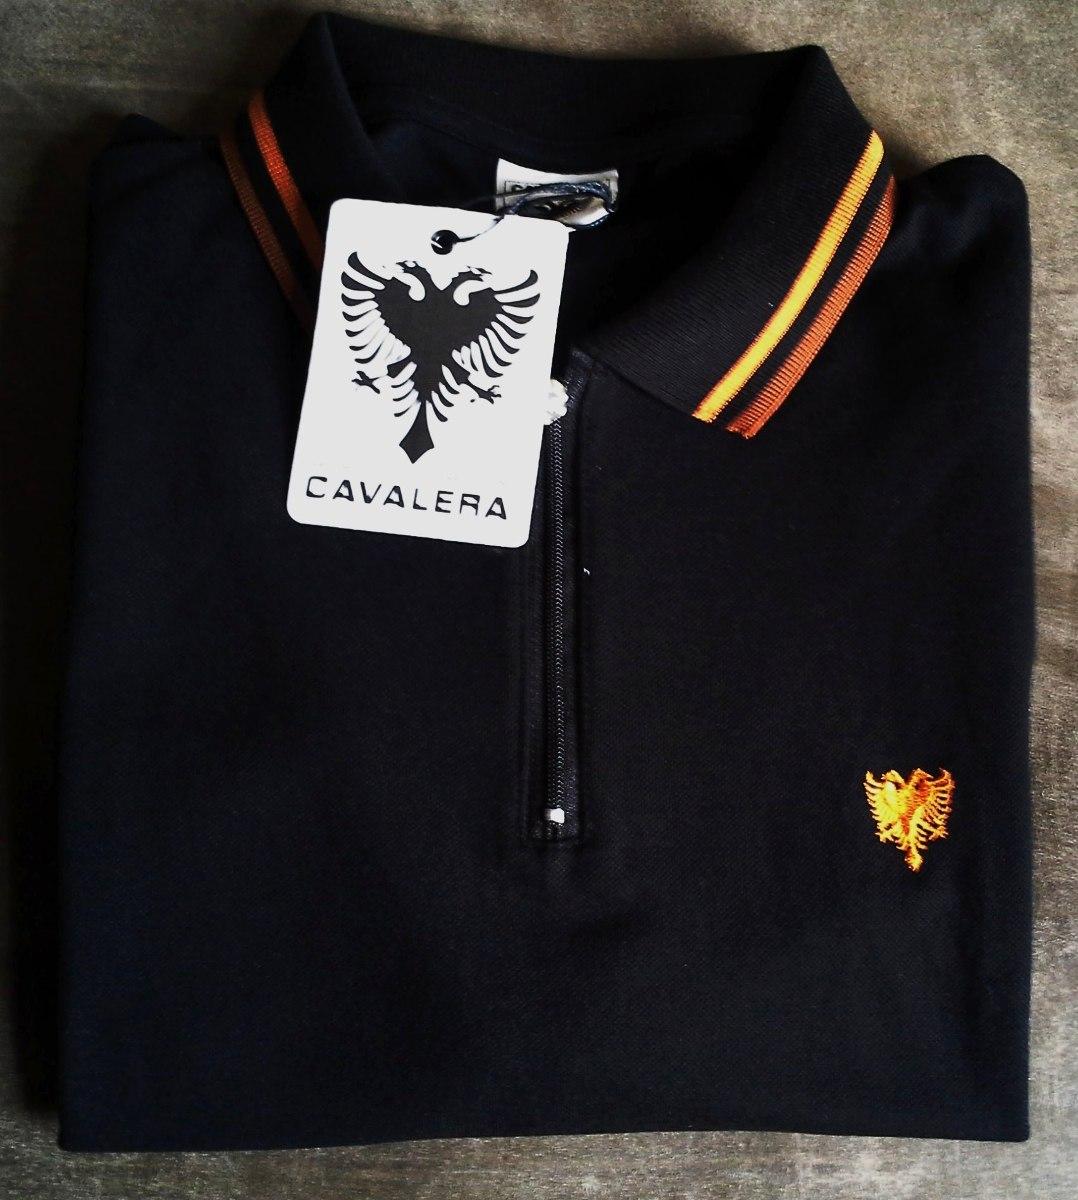 5717d90111 camisa polo masculina marca famosa cavalera tm g preta. Carregando zoom.